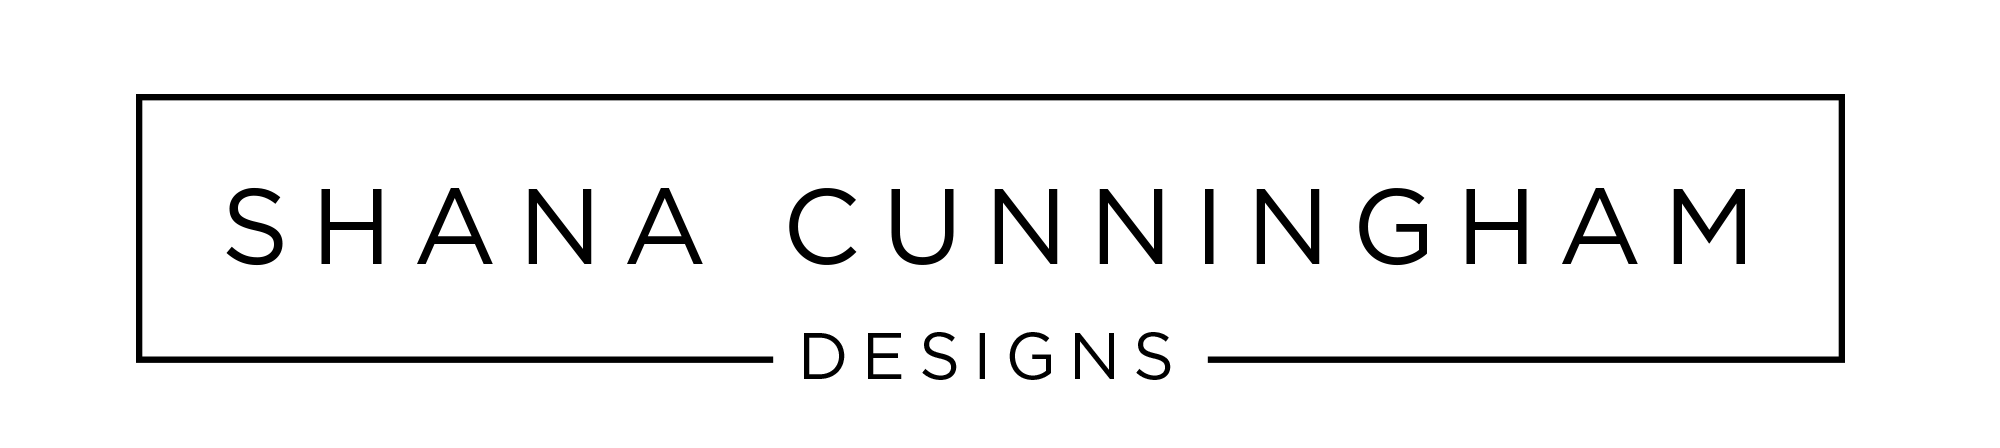 SC 1.png